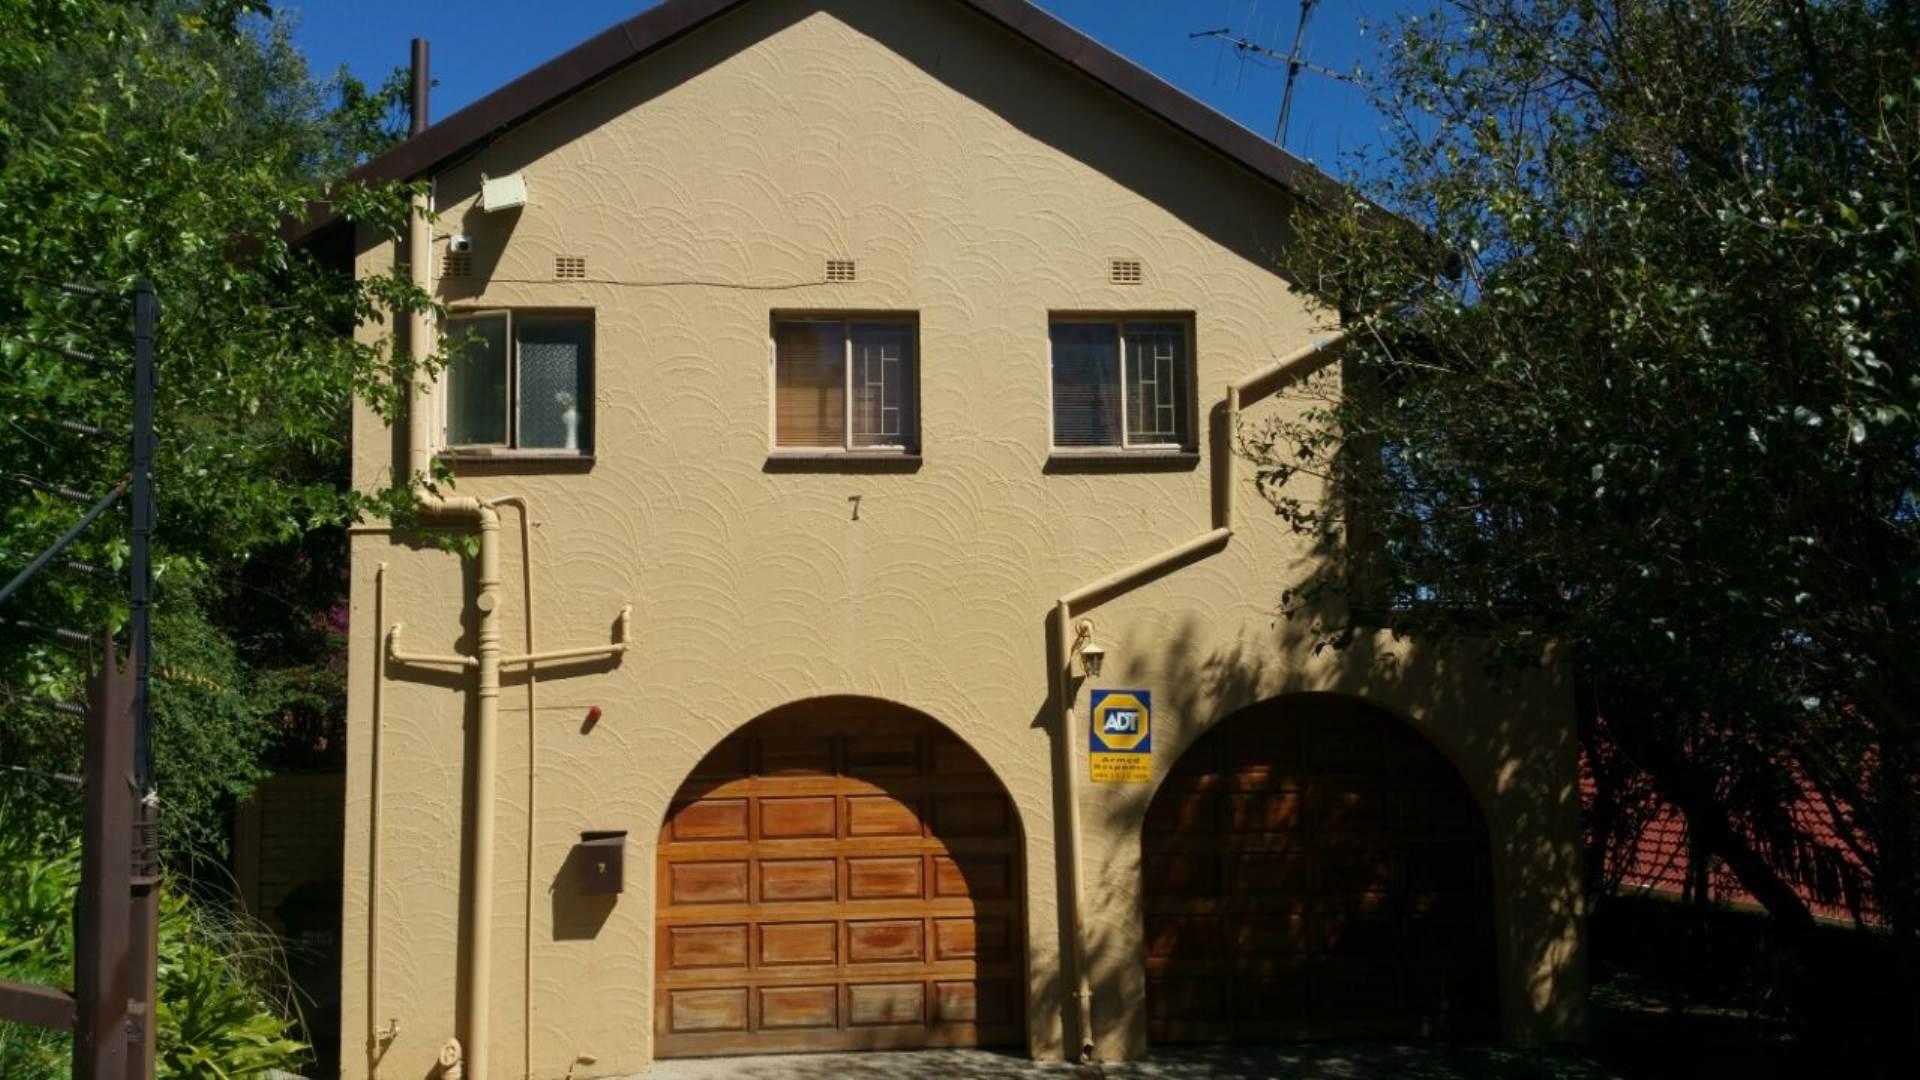 4 BedroomHouse For Sale In Breaunanda